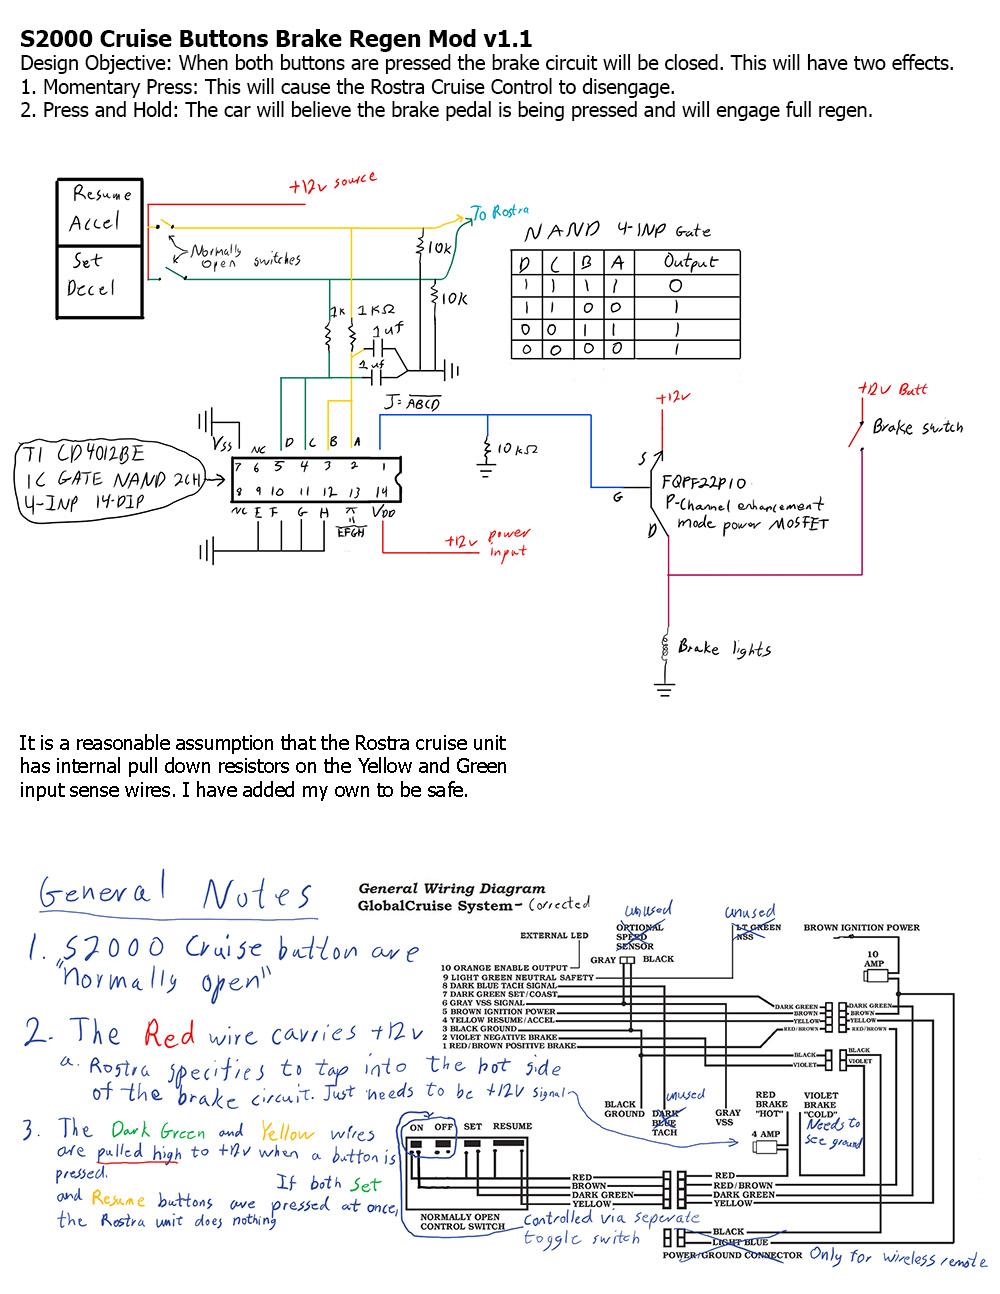 diagram suzuki cruise control diagram file xf87857